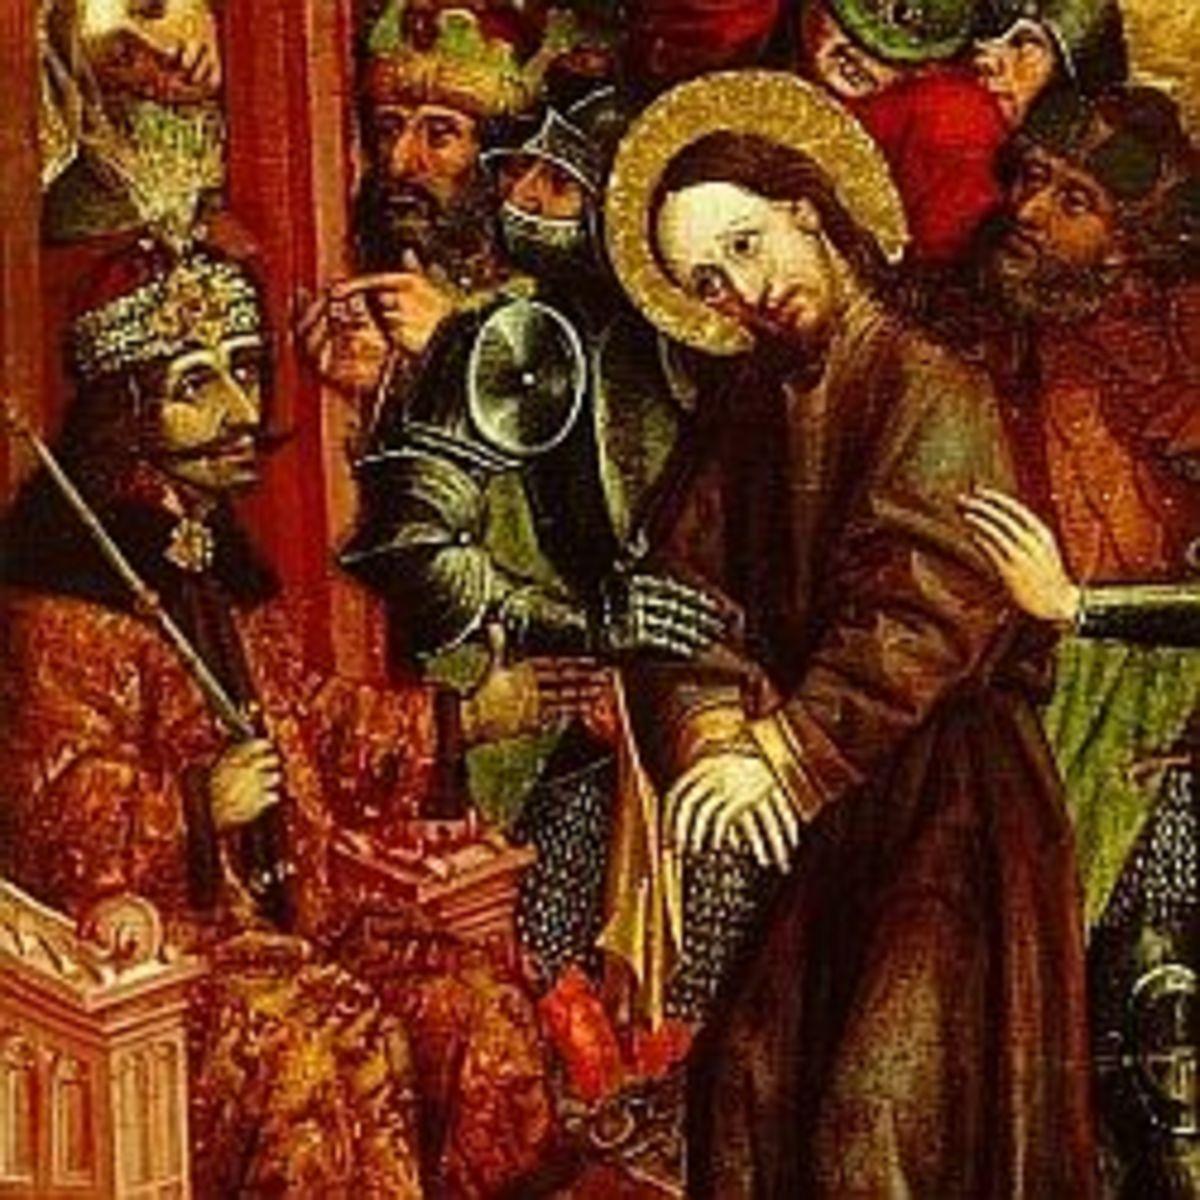 Vlad Depicted as Pilatus - Condemning Jesus